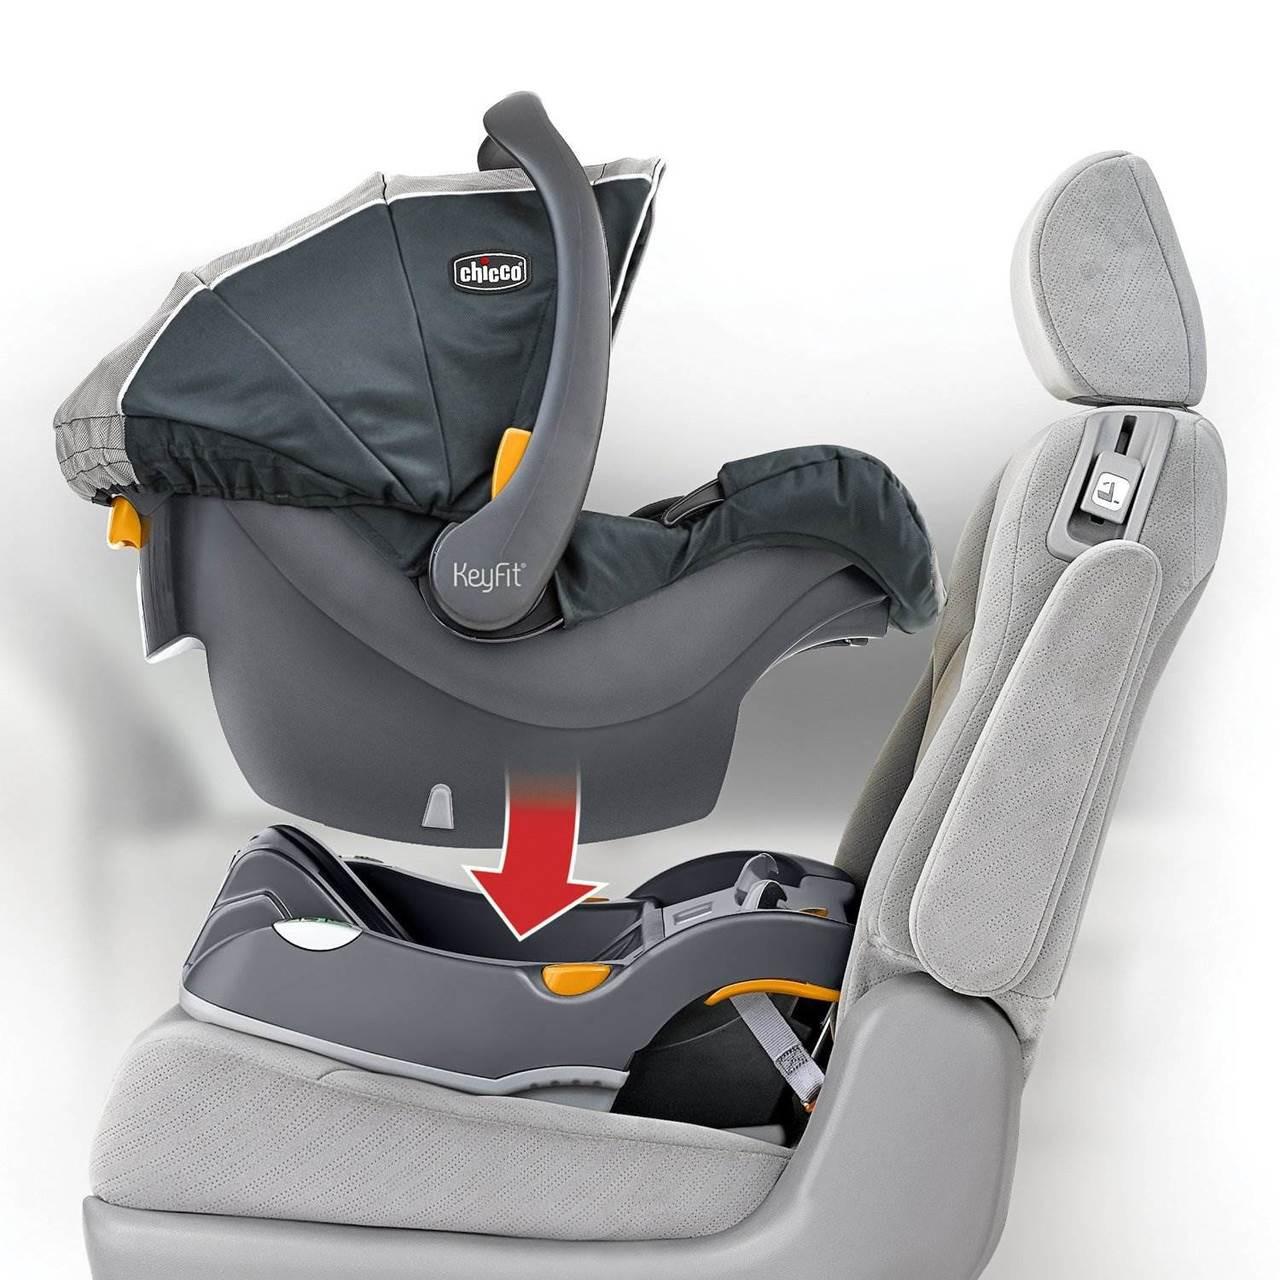 Keyfit 30 Car Seat - Orion image